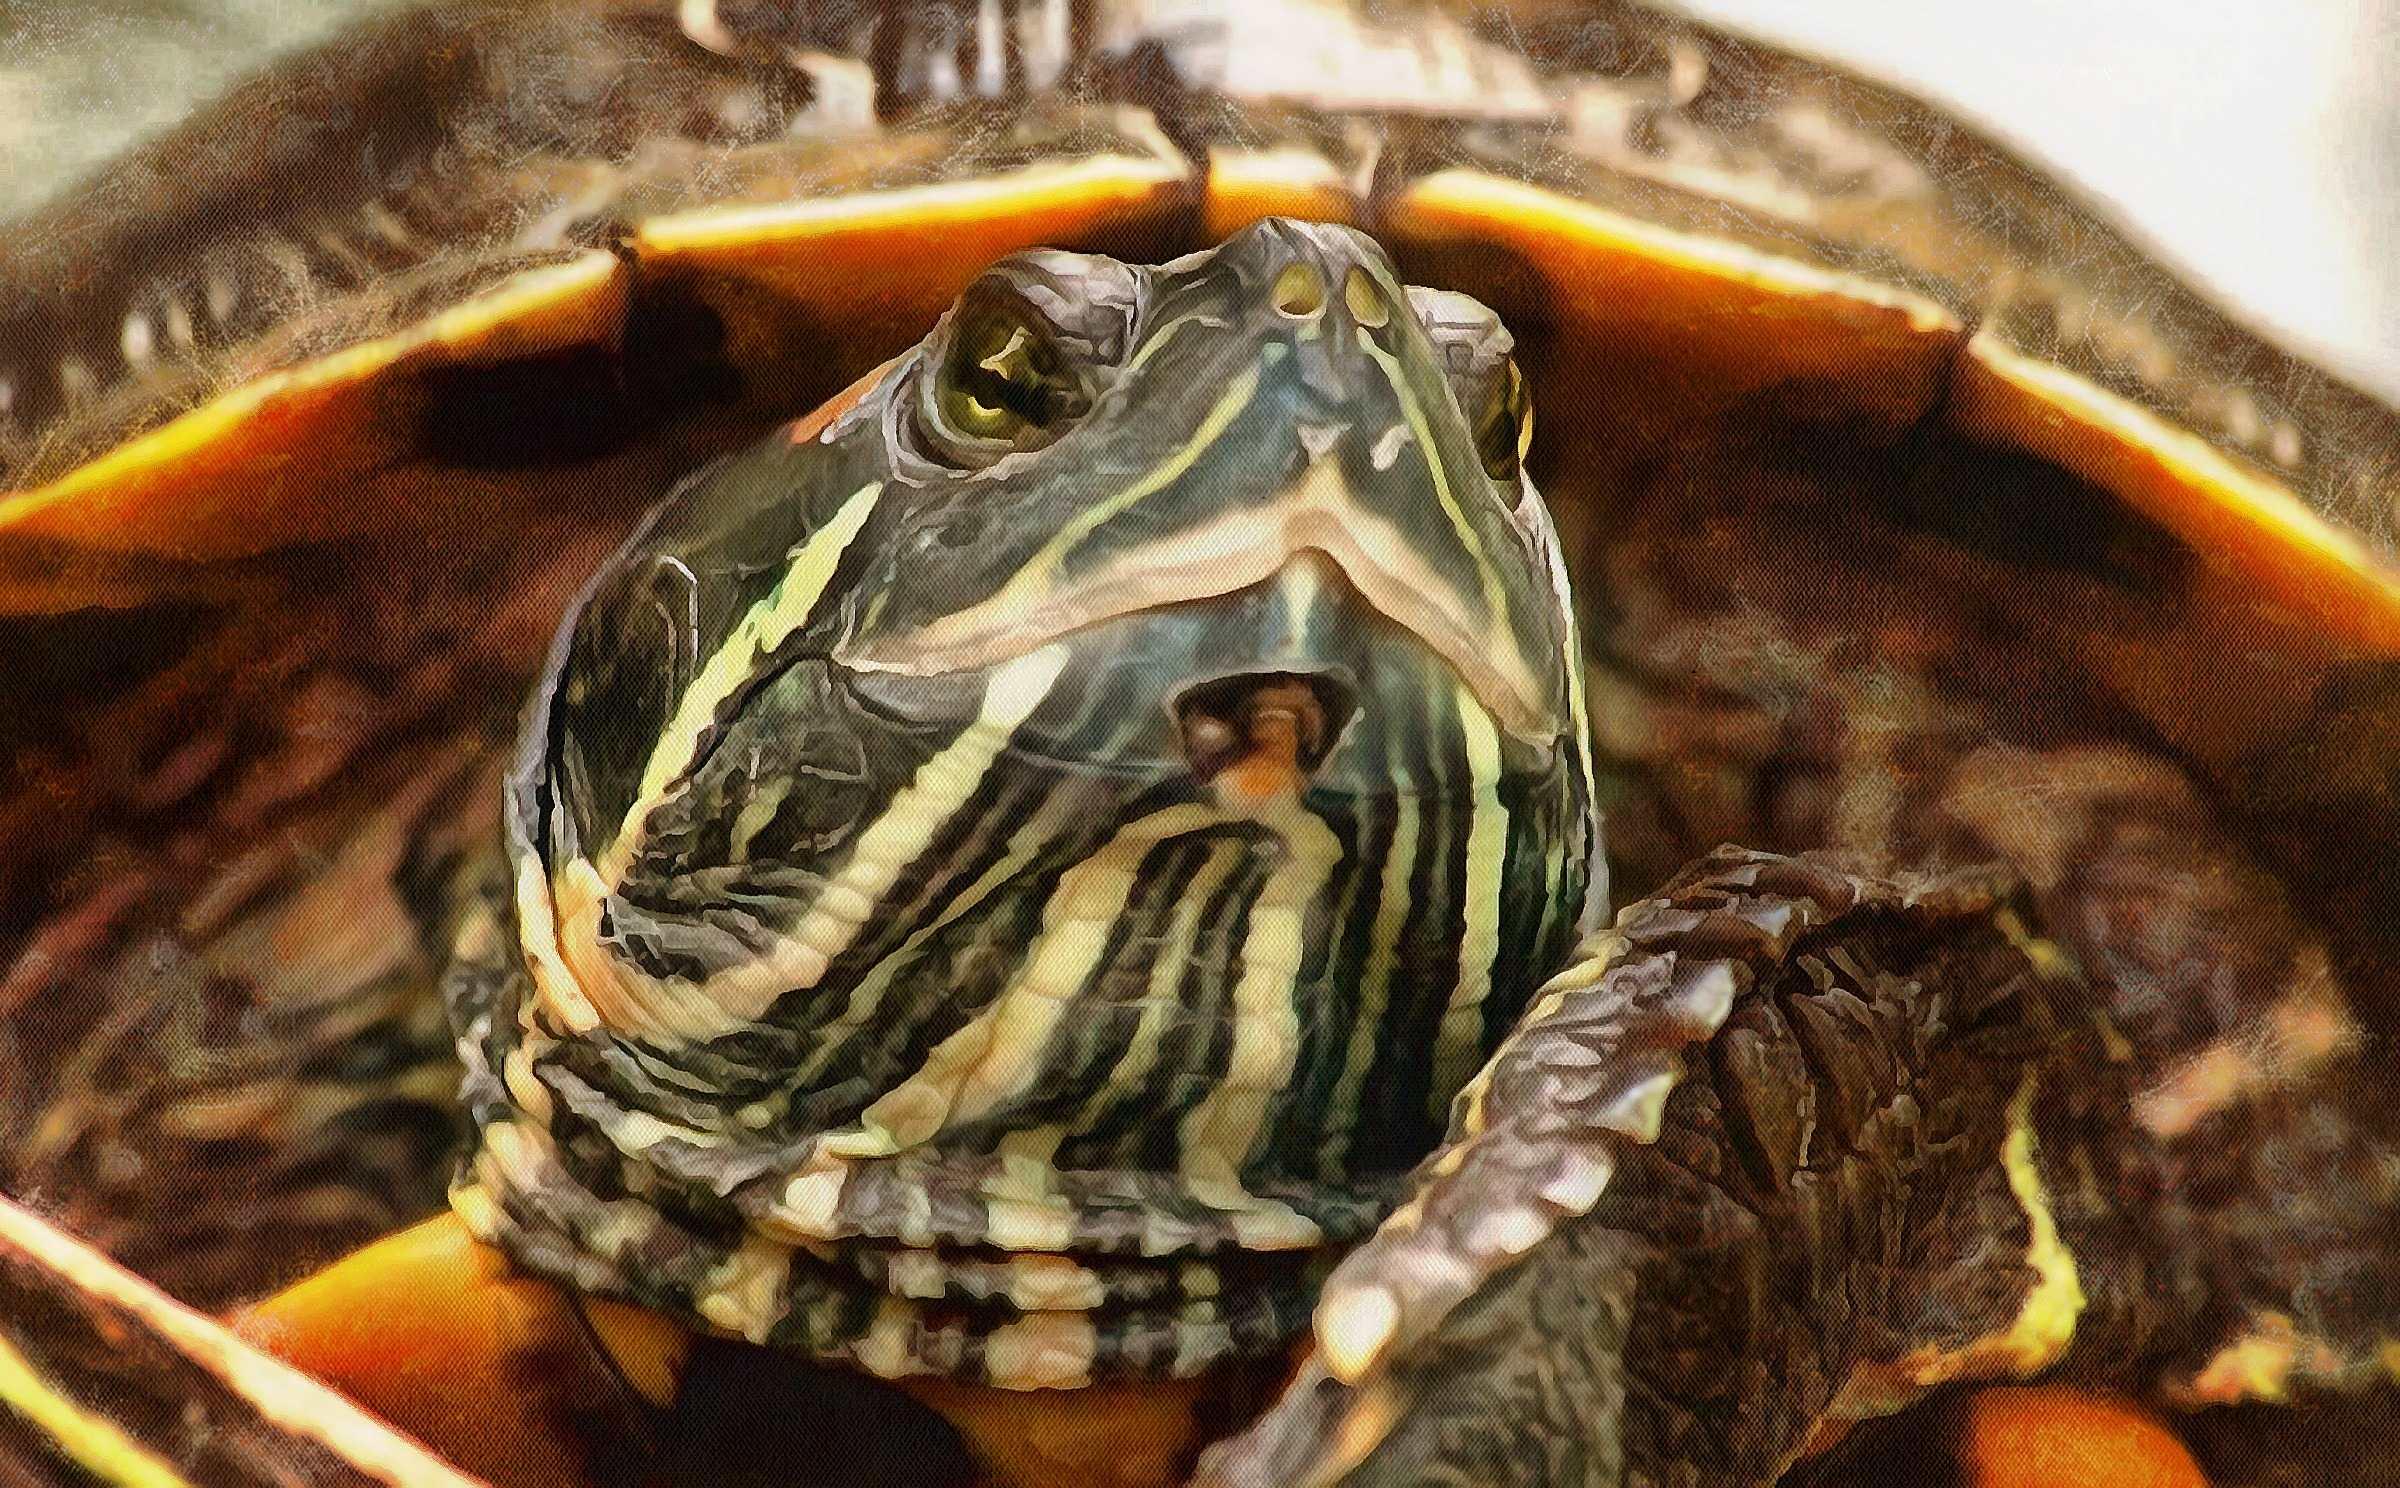 Turtle, Tortoise, Turtle free images,  – Tortoise free images, Tortoise free , Turtle stock free images, free images turtles, tortoise free , tortoise public domain images!